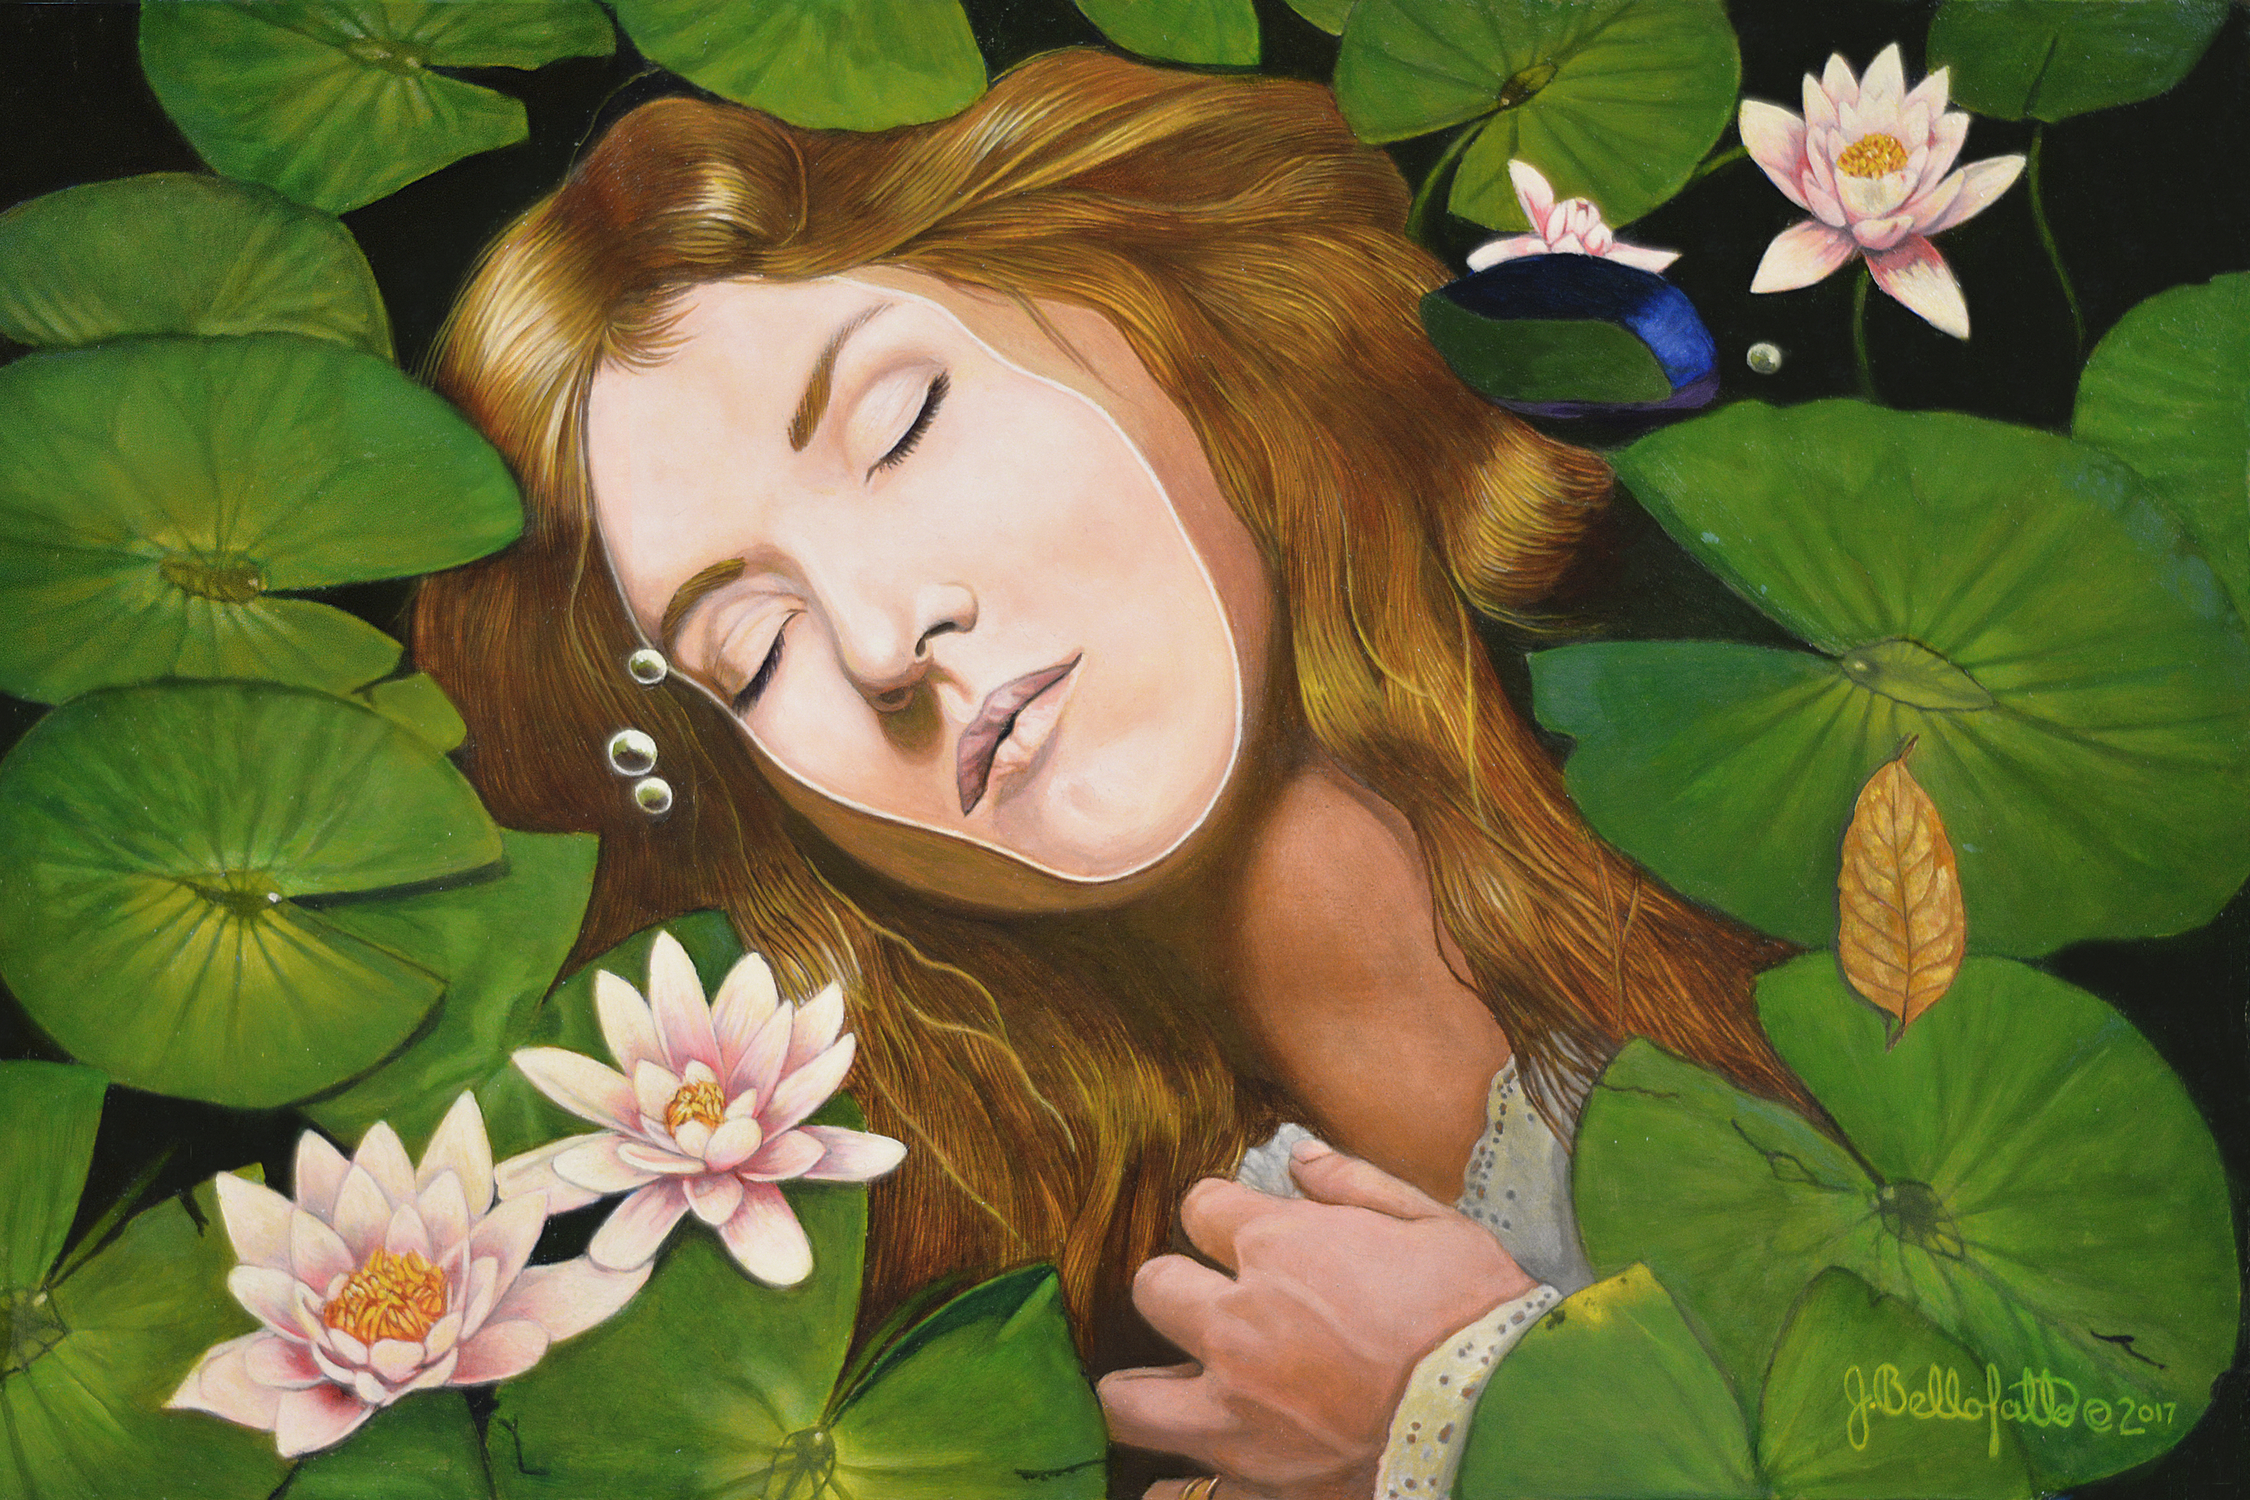 Drowning in Sorrow Artwork by Joseph Bellofatto